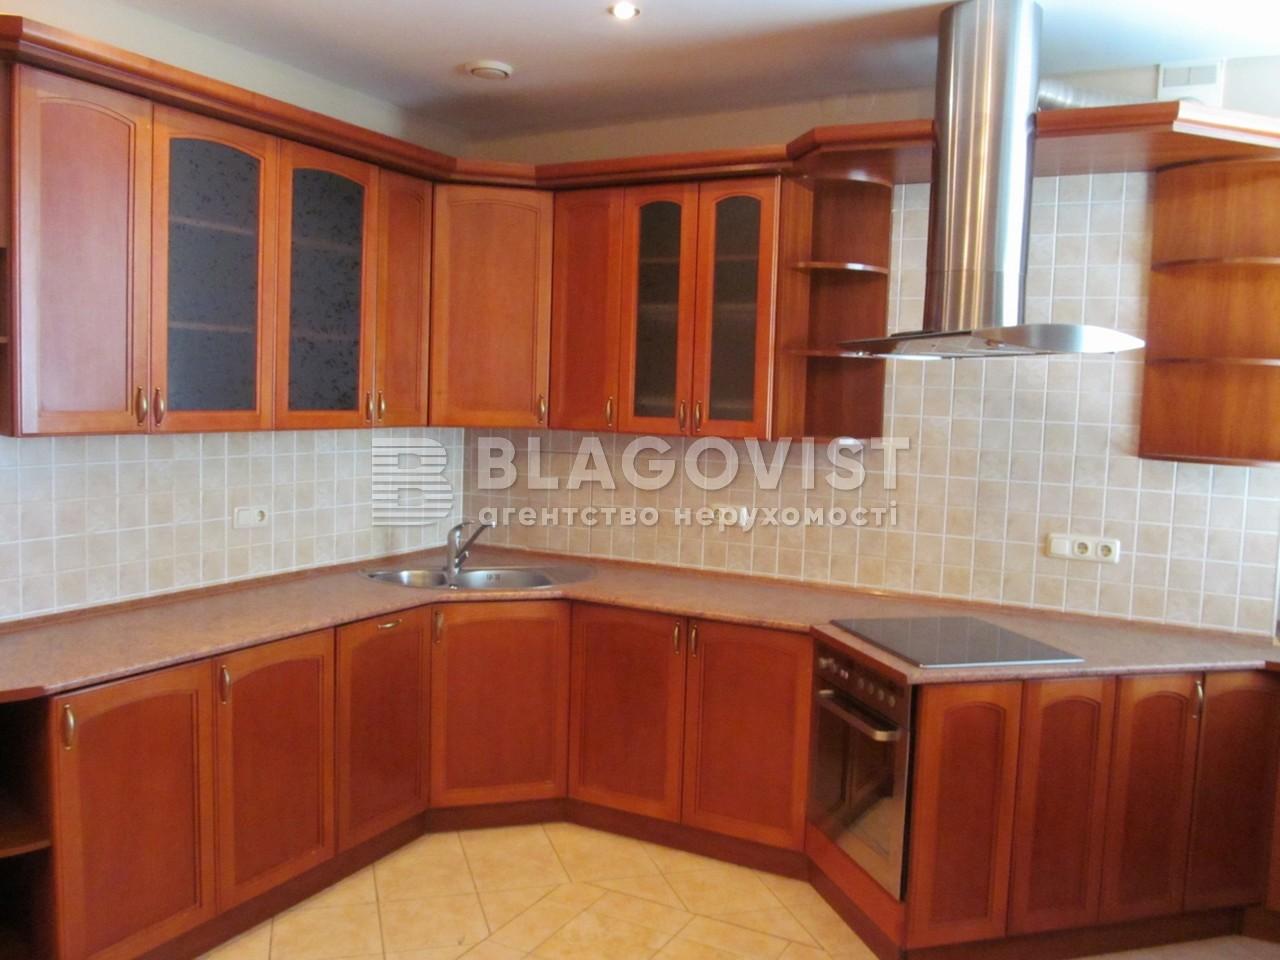 Квартира Z-1439953, Деревлянская (Якира), 10а, Киев - Фото 7